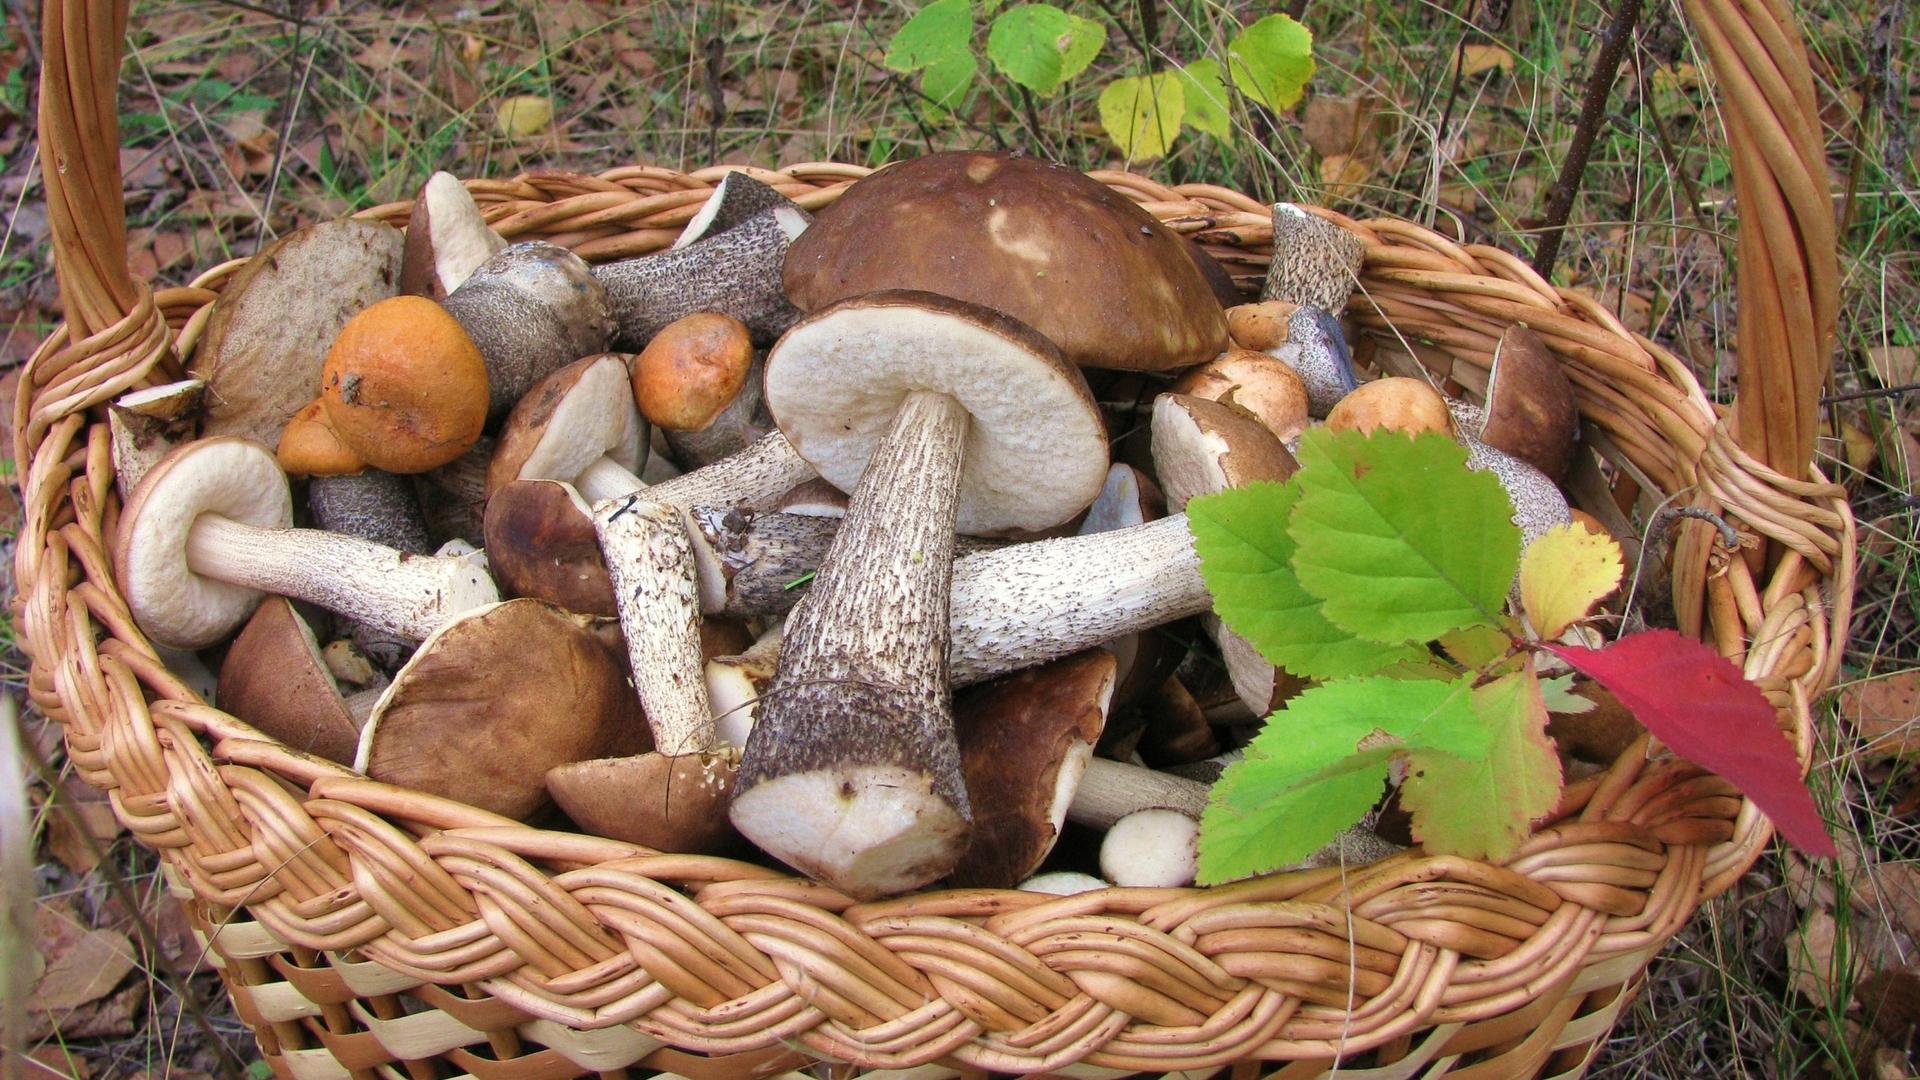 Картинка корзина с грибами на рабочий стол